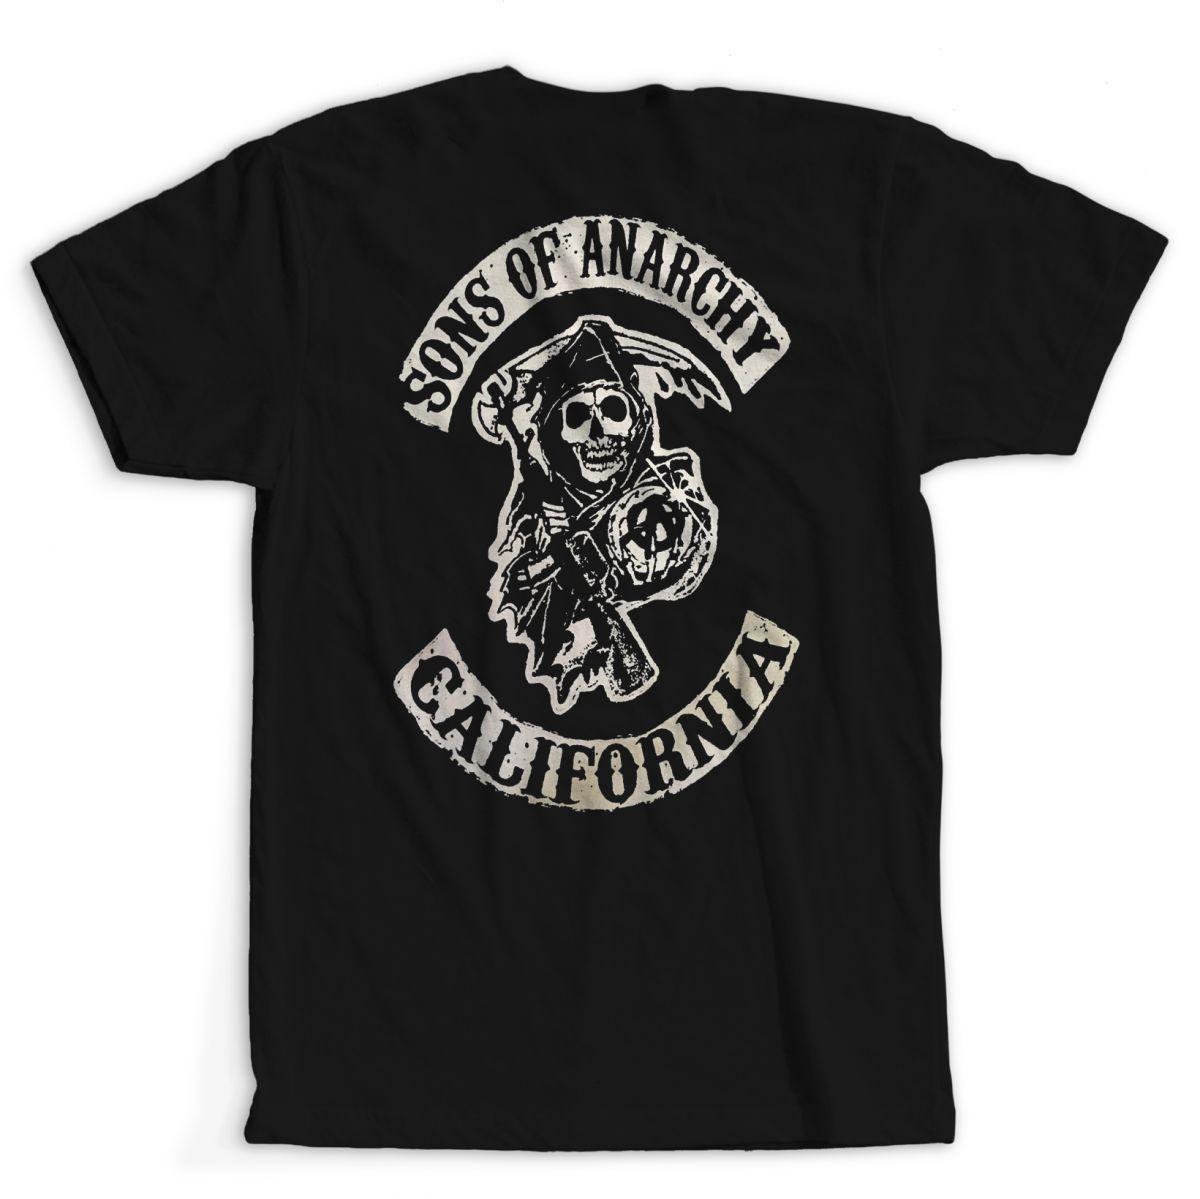 Camiseta Sons Of Arnachy (SAMCRO)